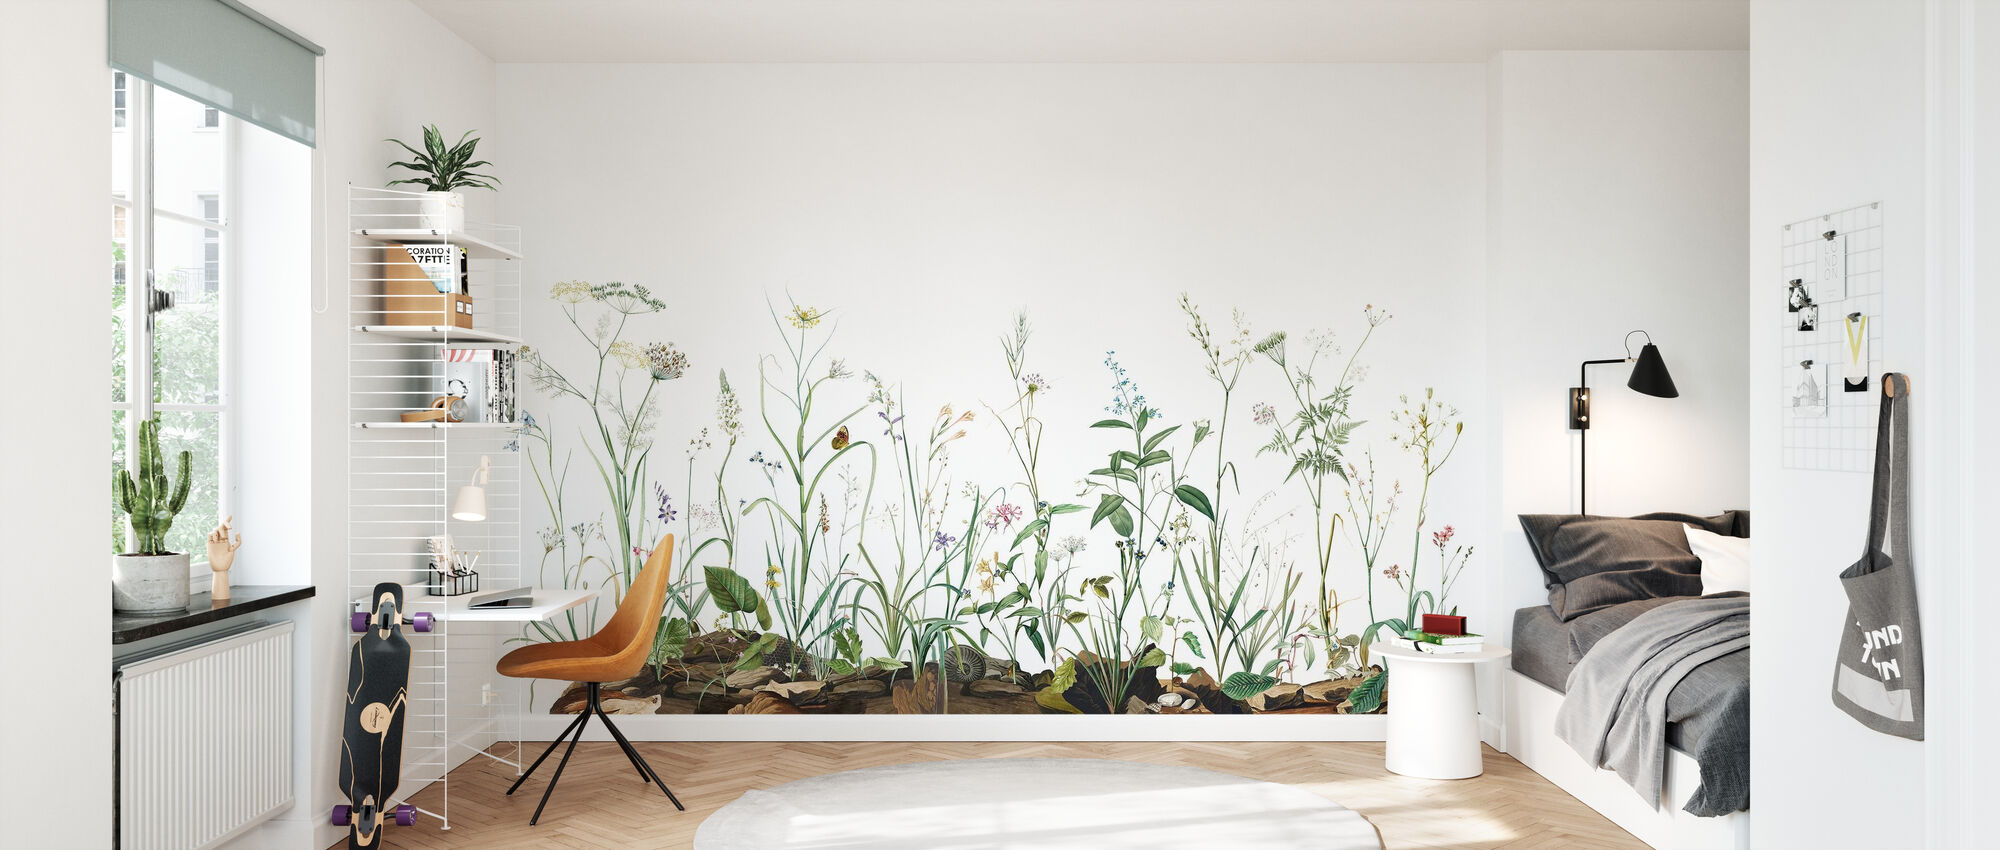 Midsummer Trail - Broken White - Wallpaper - Kids Room